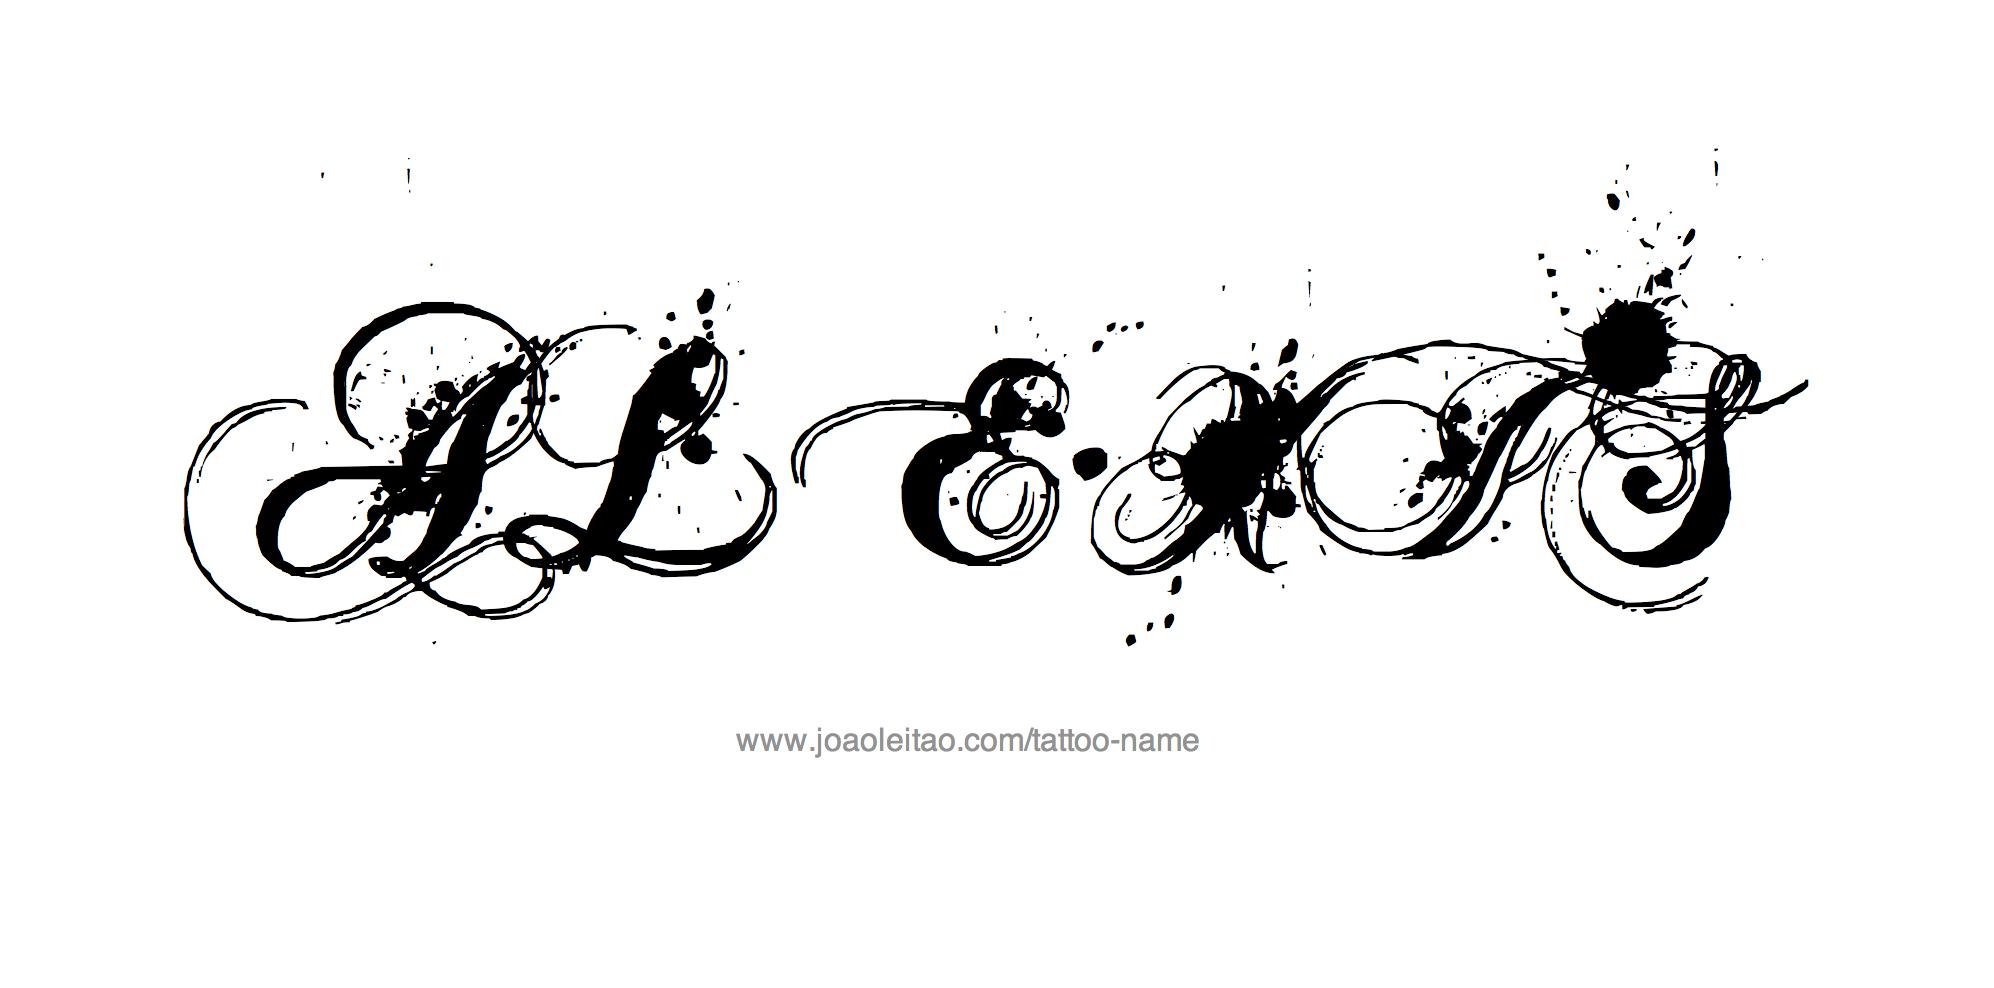 Name tattoo designs free - Tattoo Design Name Alexis